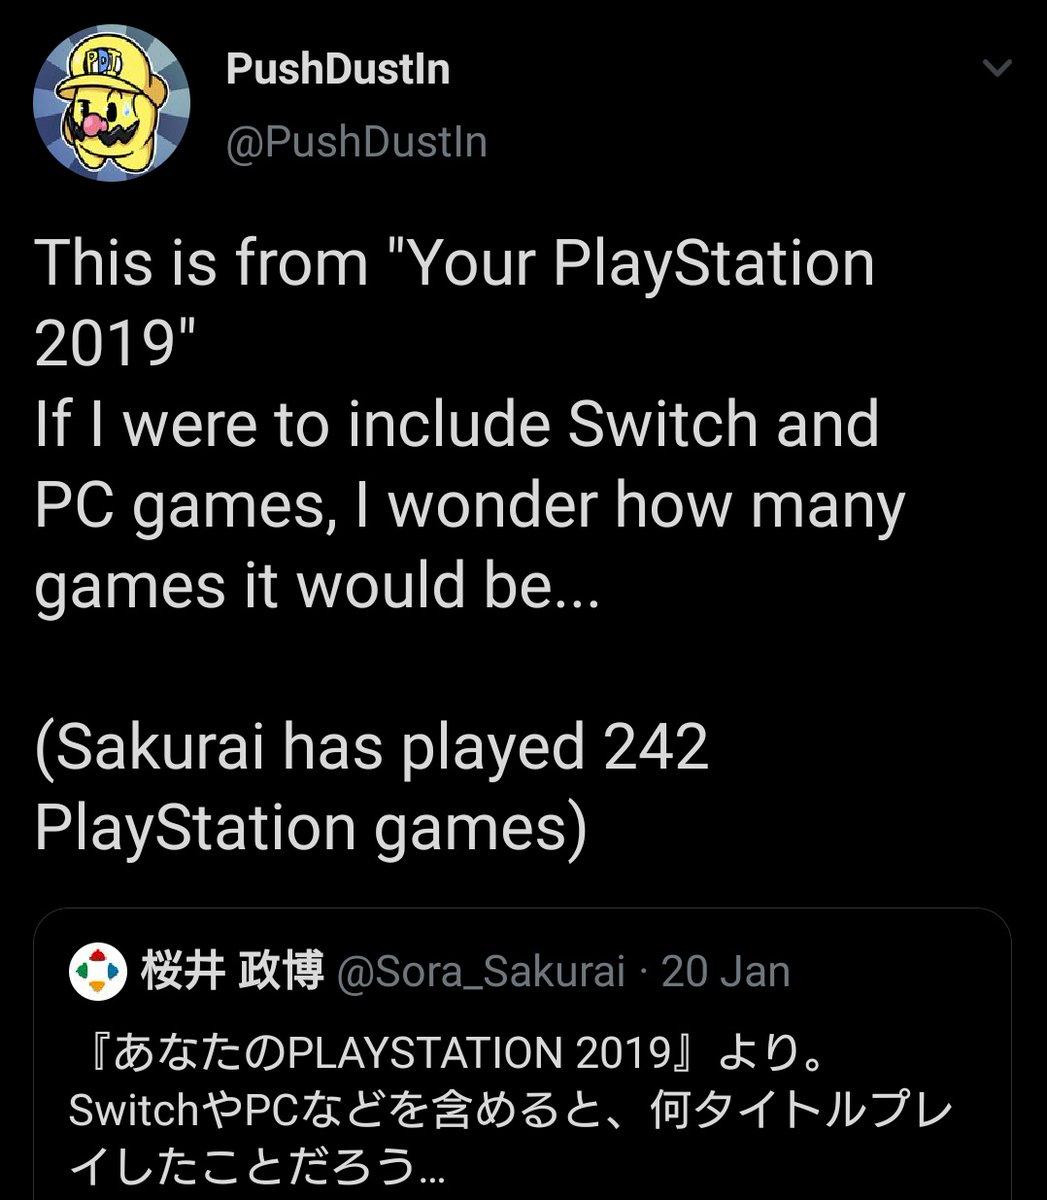 Replying to @PushDustIn: Just a reminder that Masahiro Sakurai plays more games than you do.